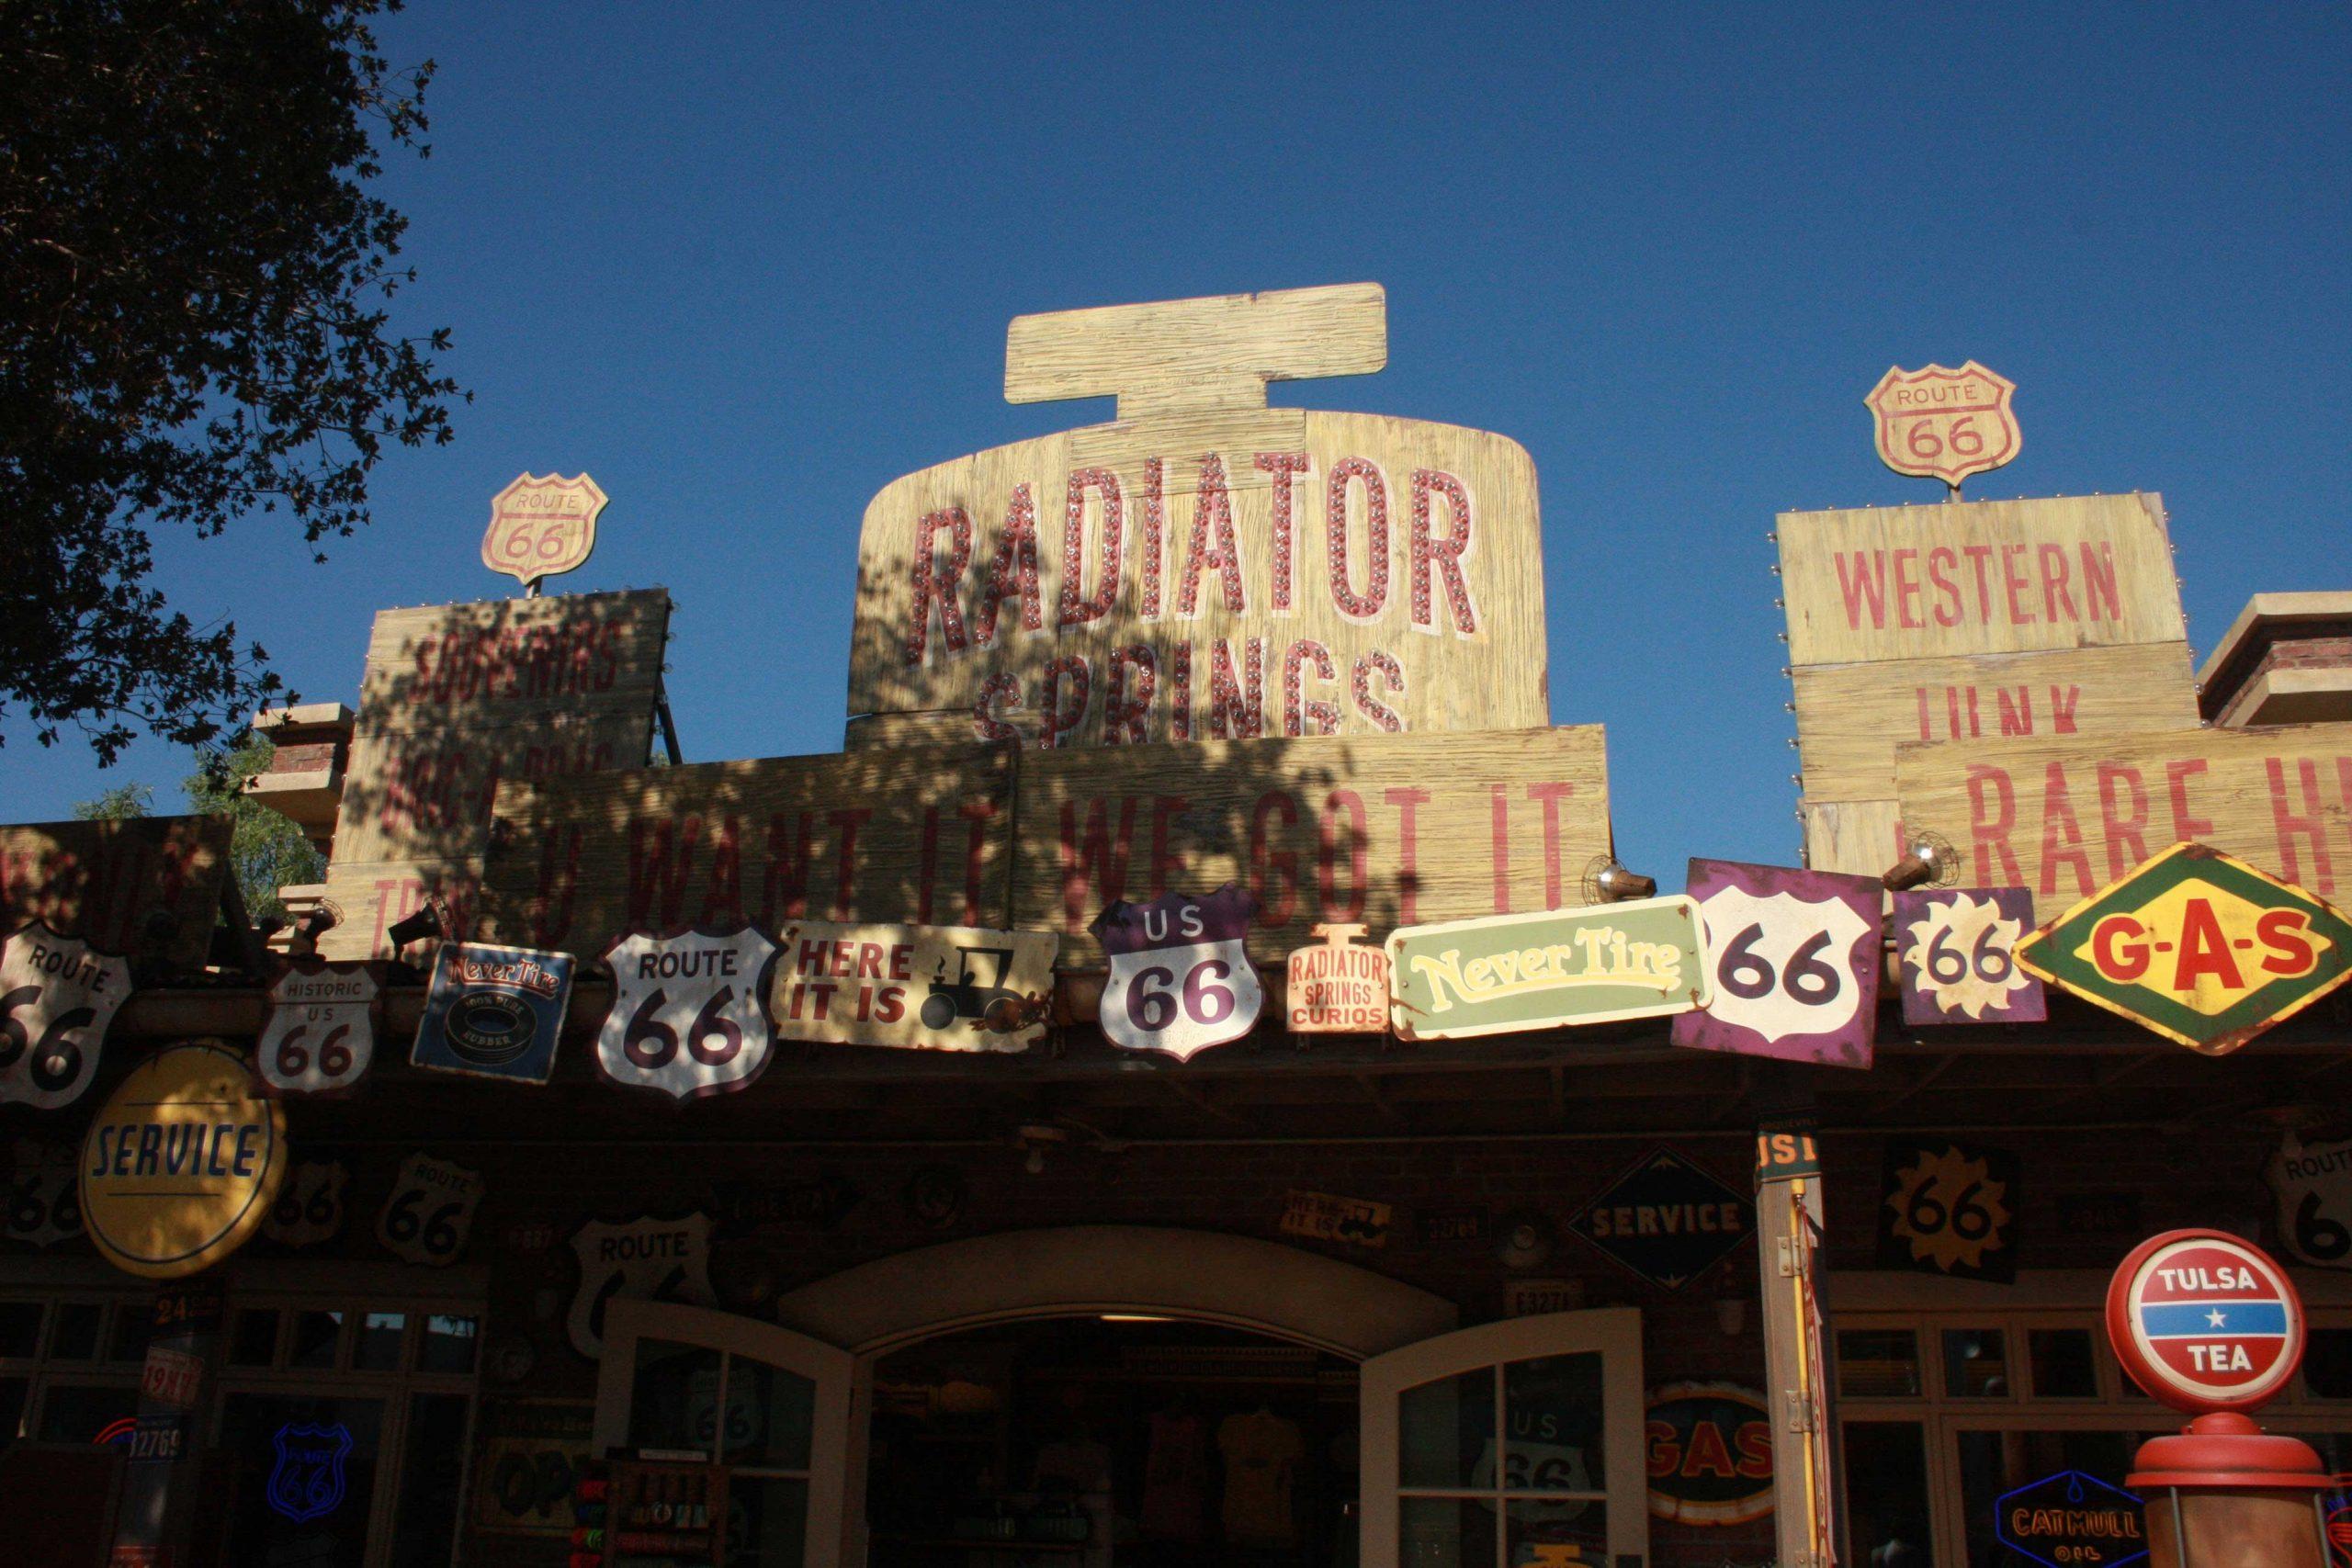 Radiator Springs Curios Wanderdisney